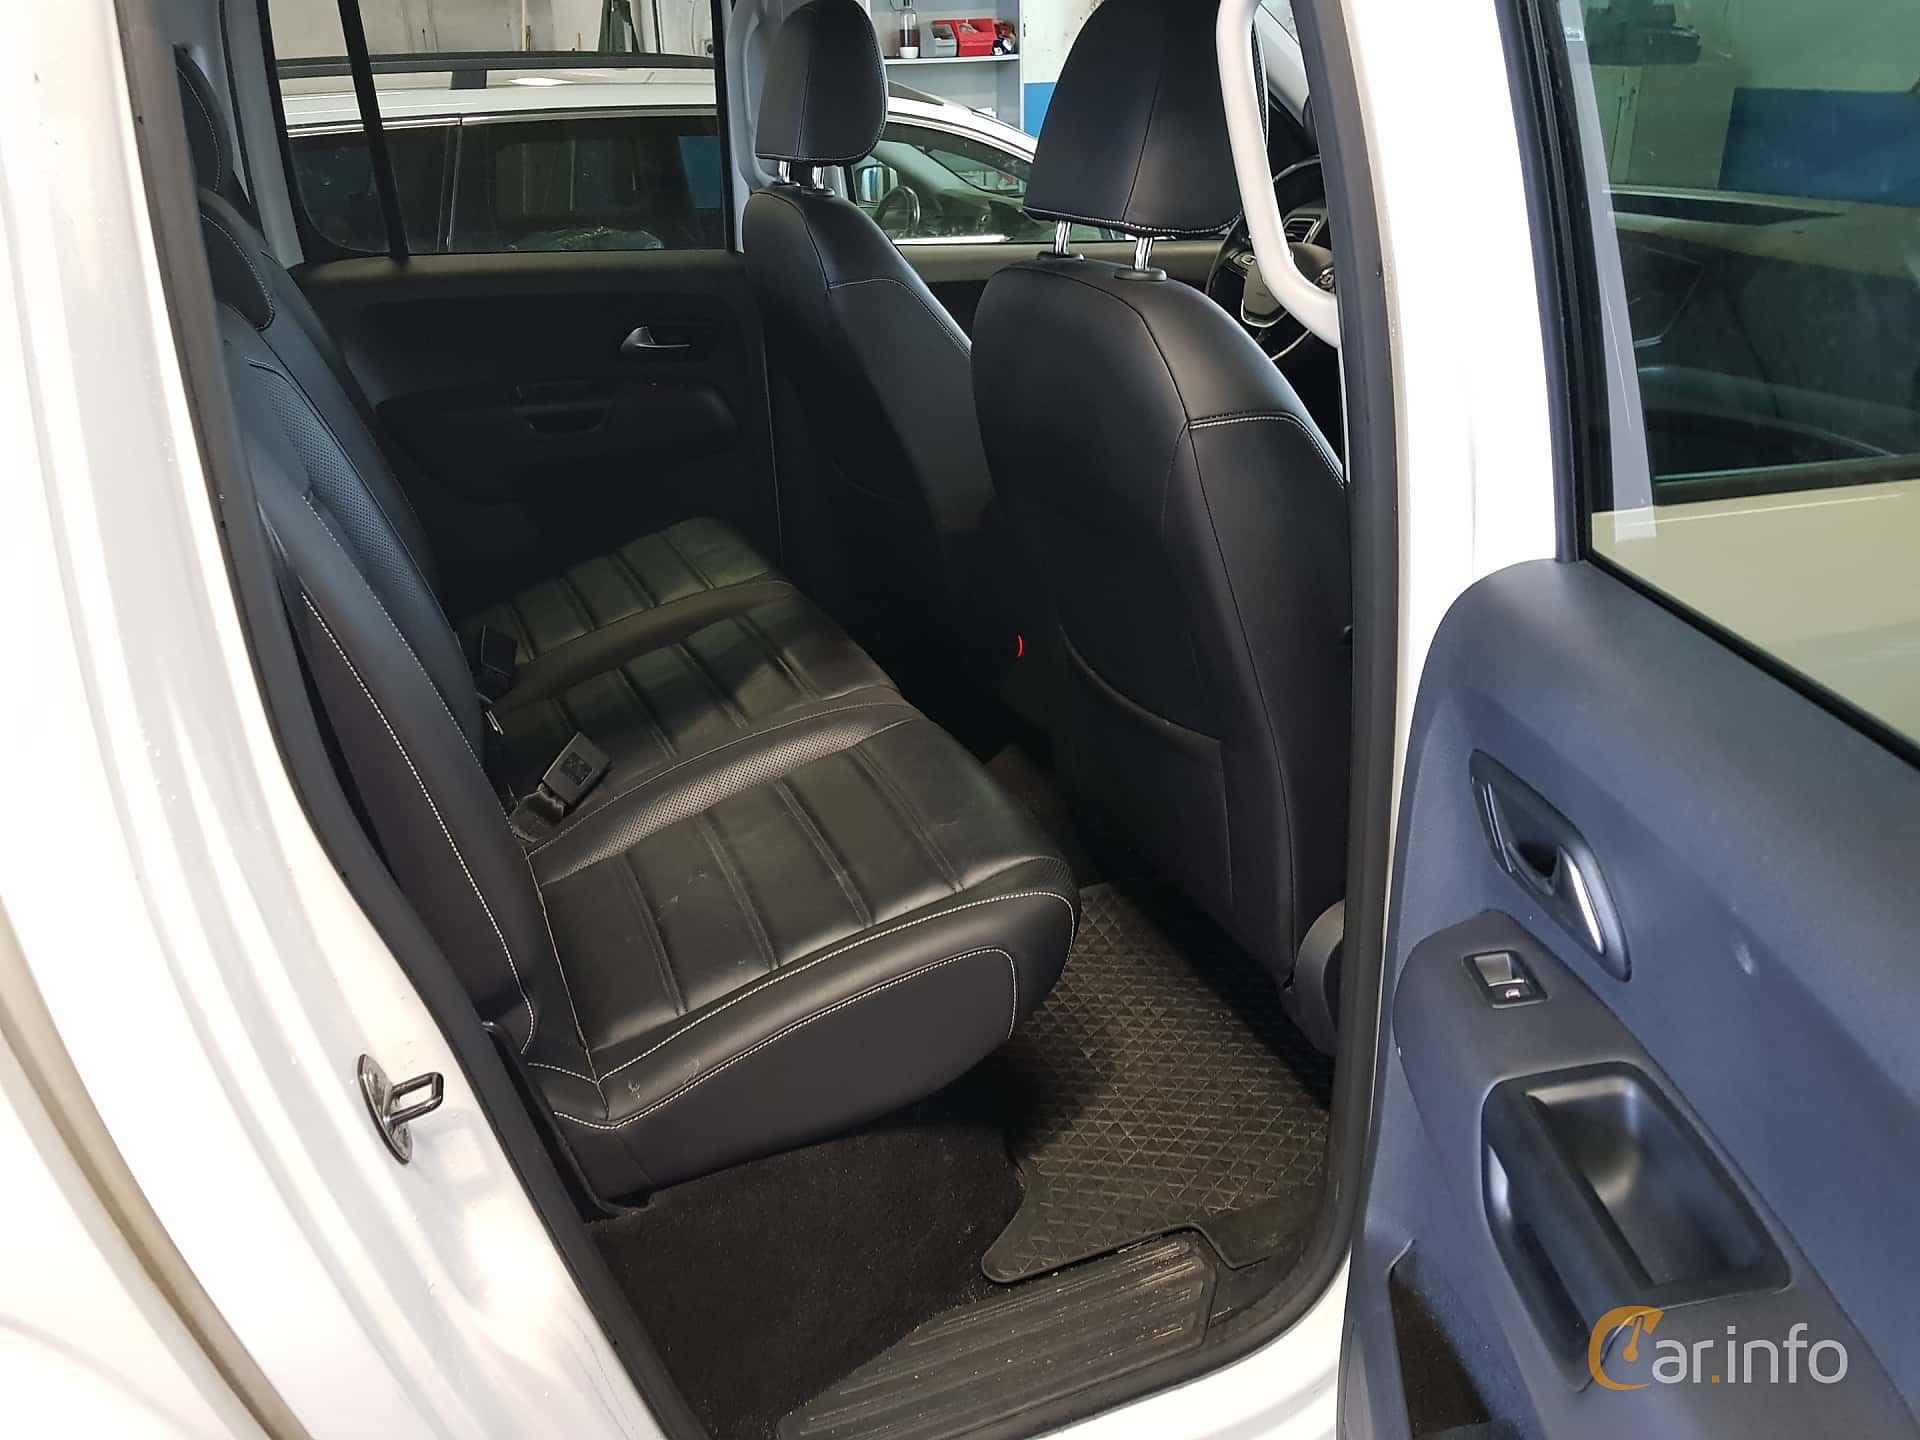 Volkswagen Amarok Dual Cab 3.0 V6 TDI BlueMotion 4Motion Automatic, 225hp, 2017